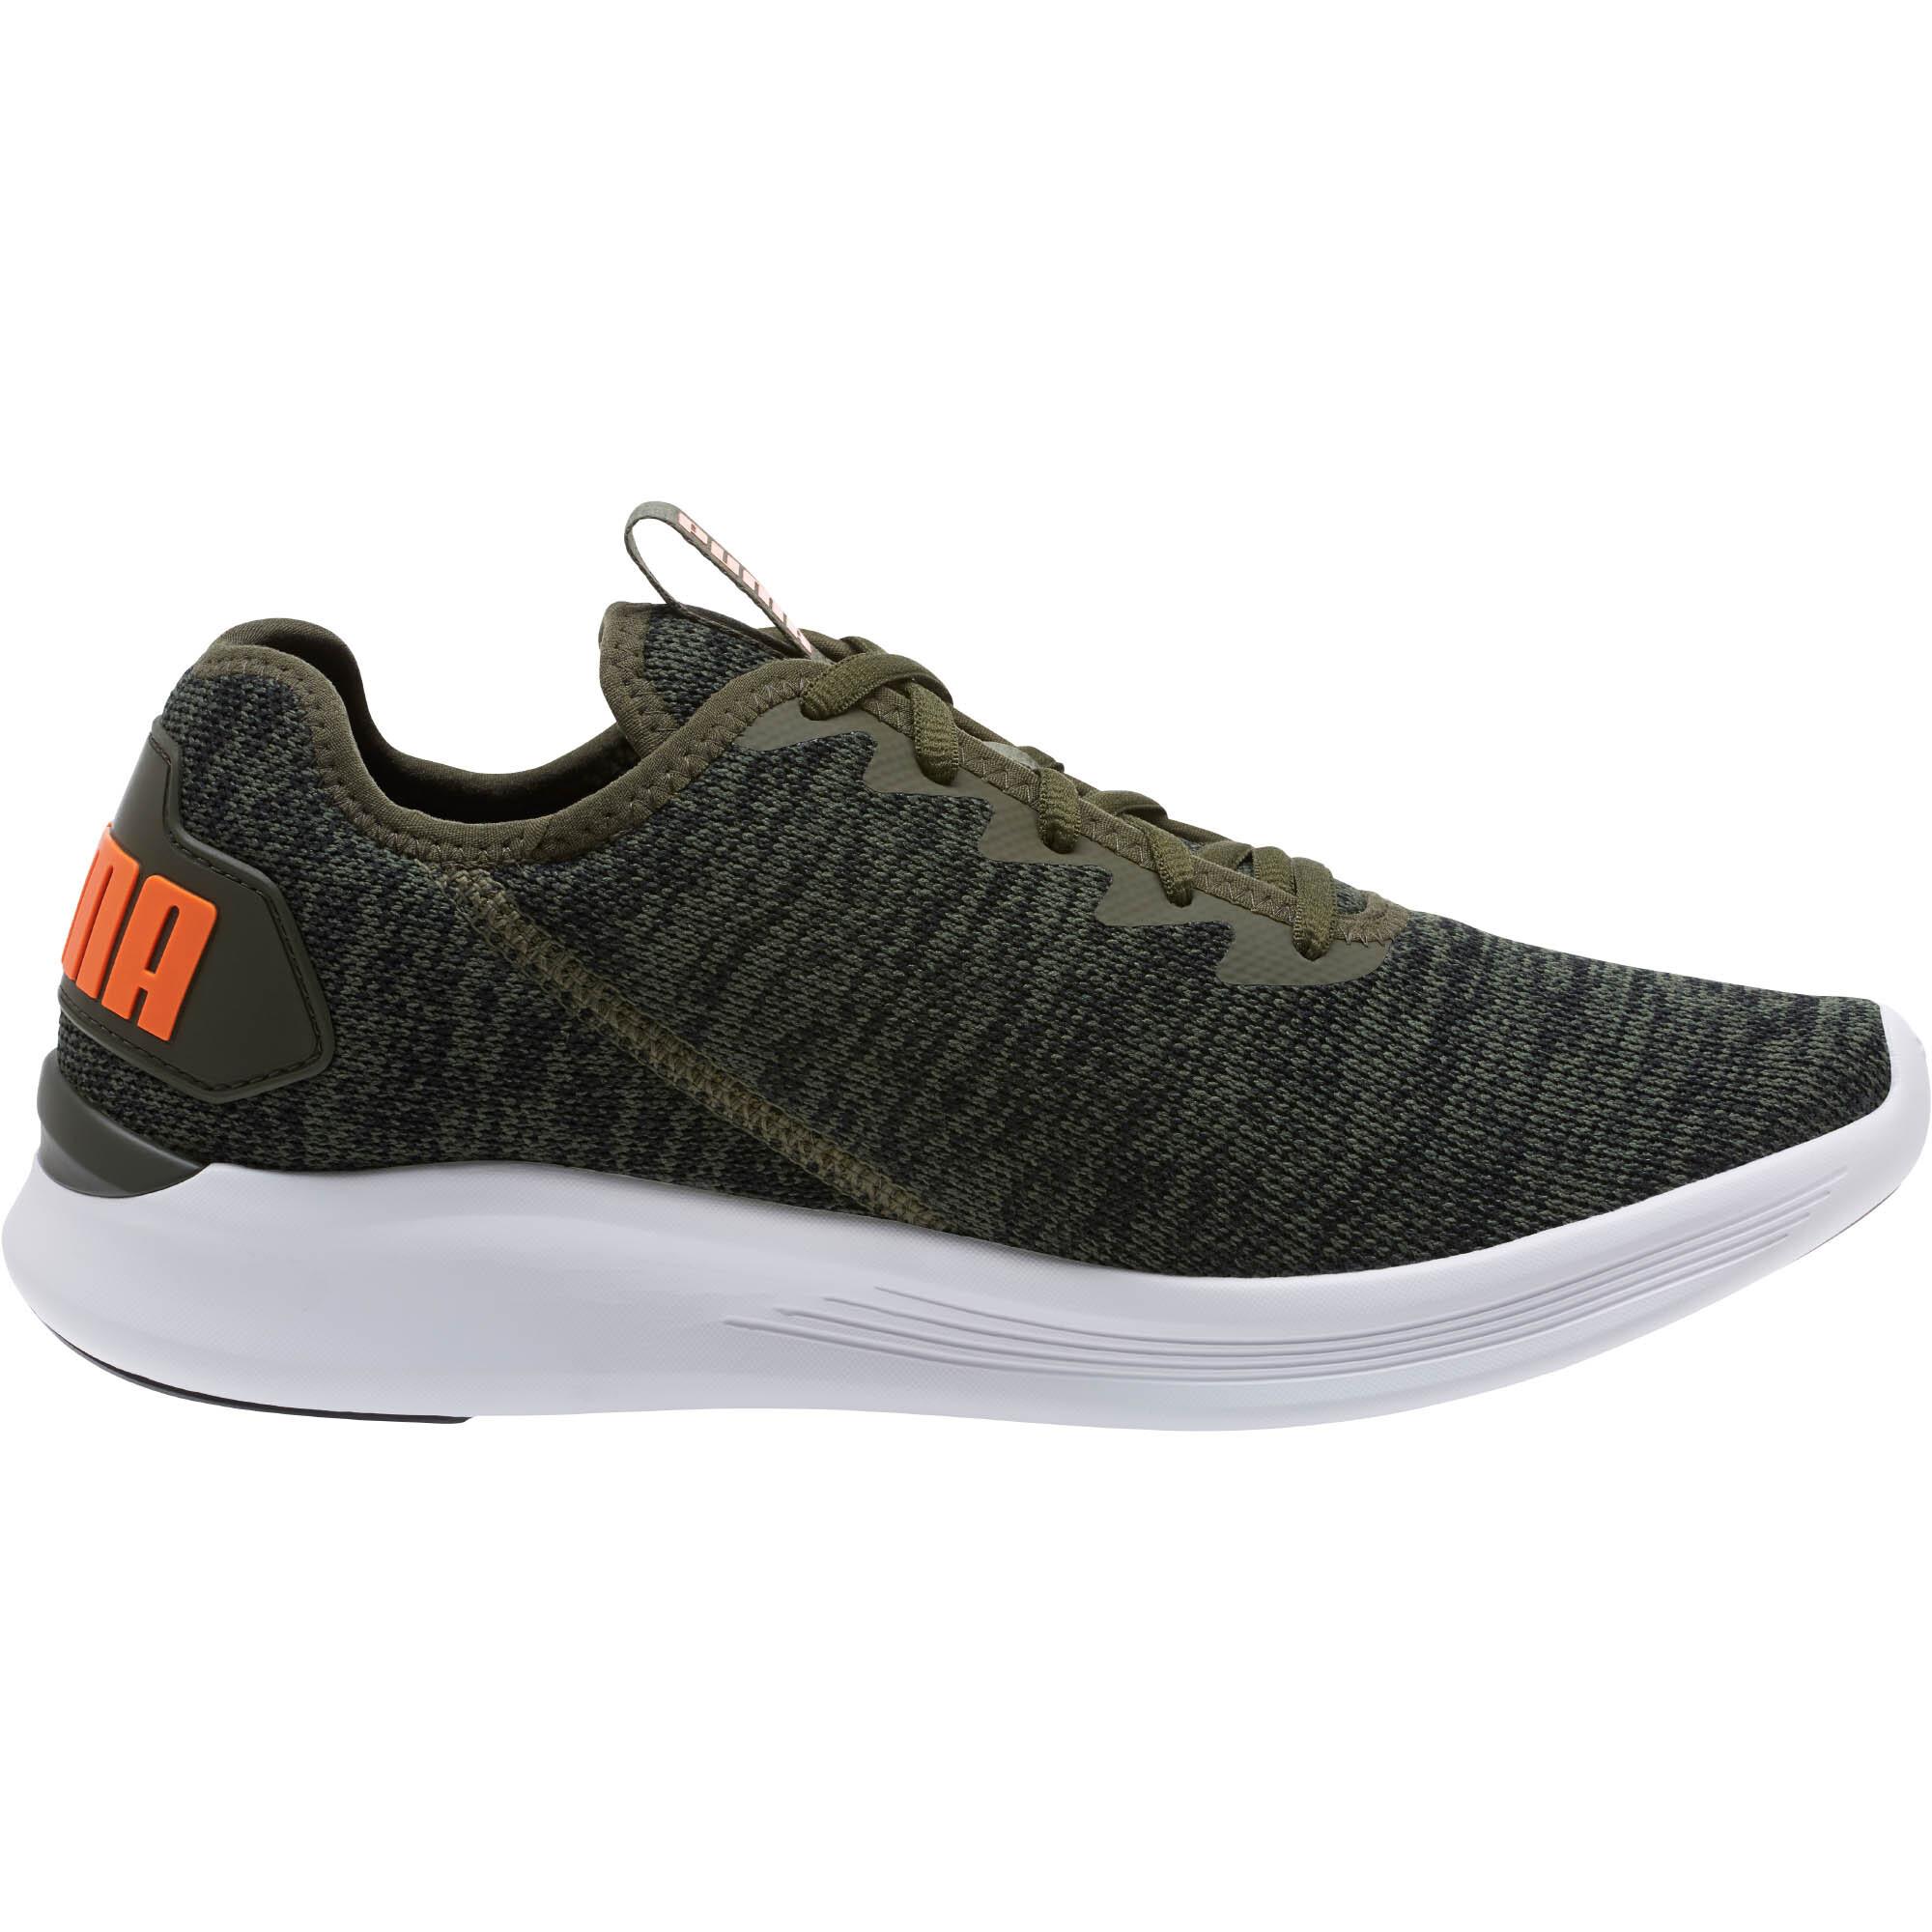 PUMA-Ballast-Men-039-s-Running-Shoes-Men-Shoe-Running thumbnail 6